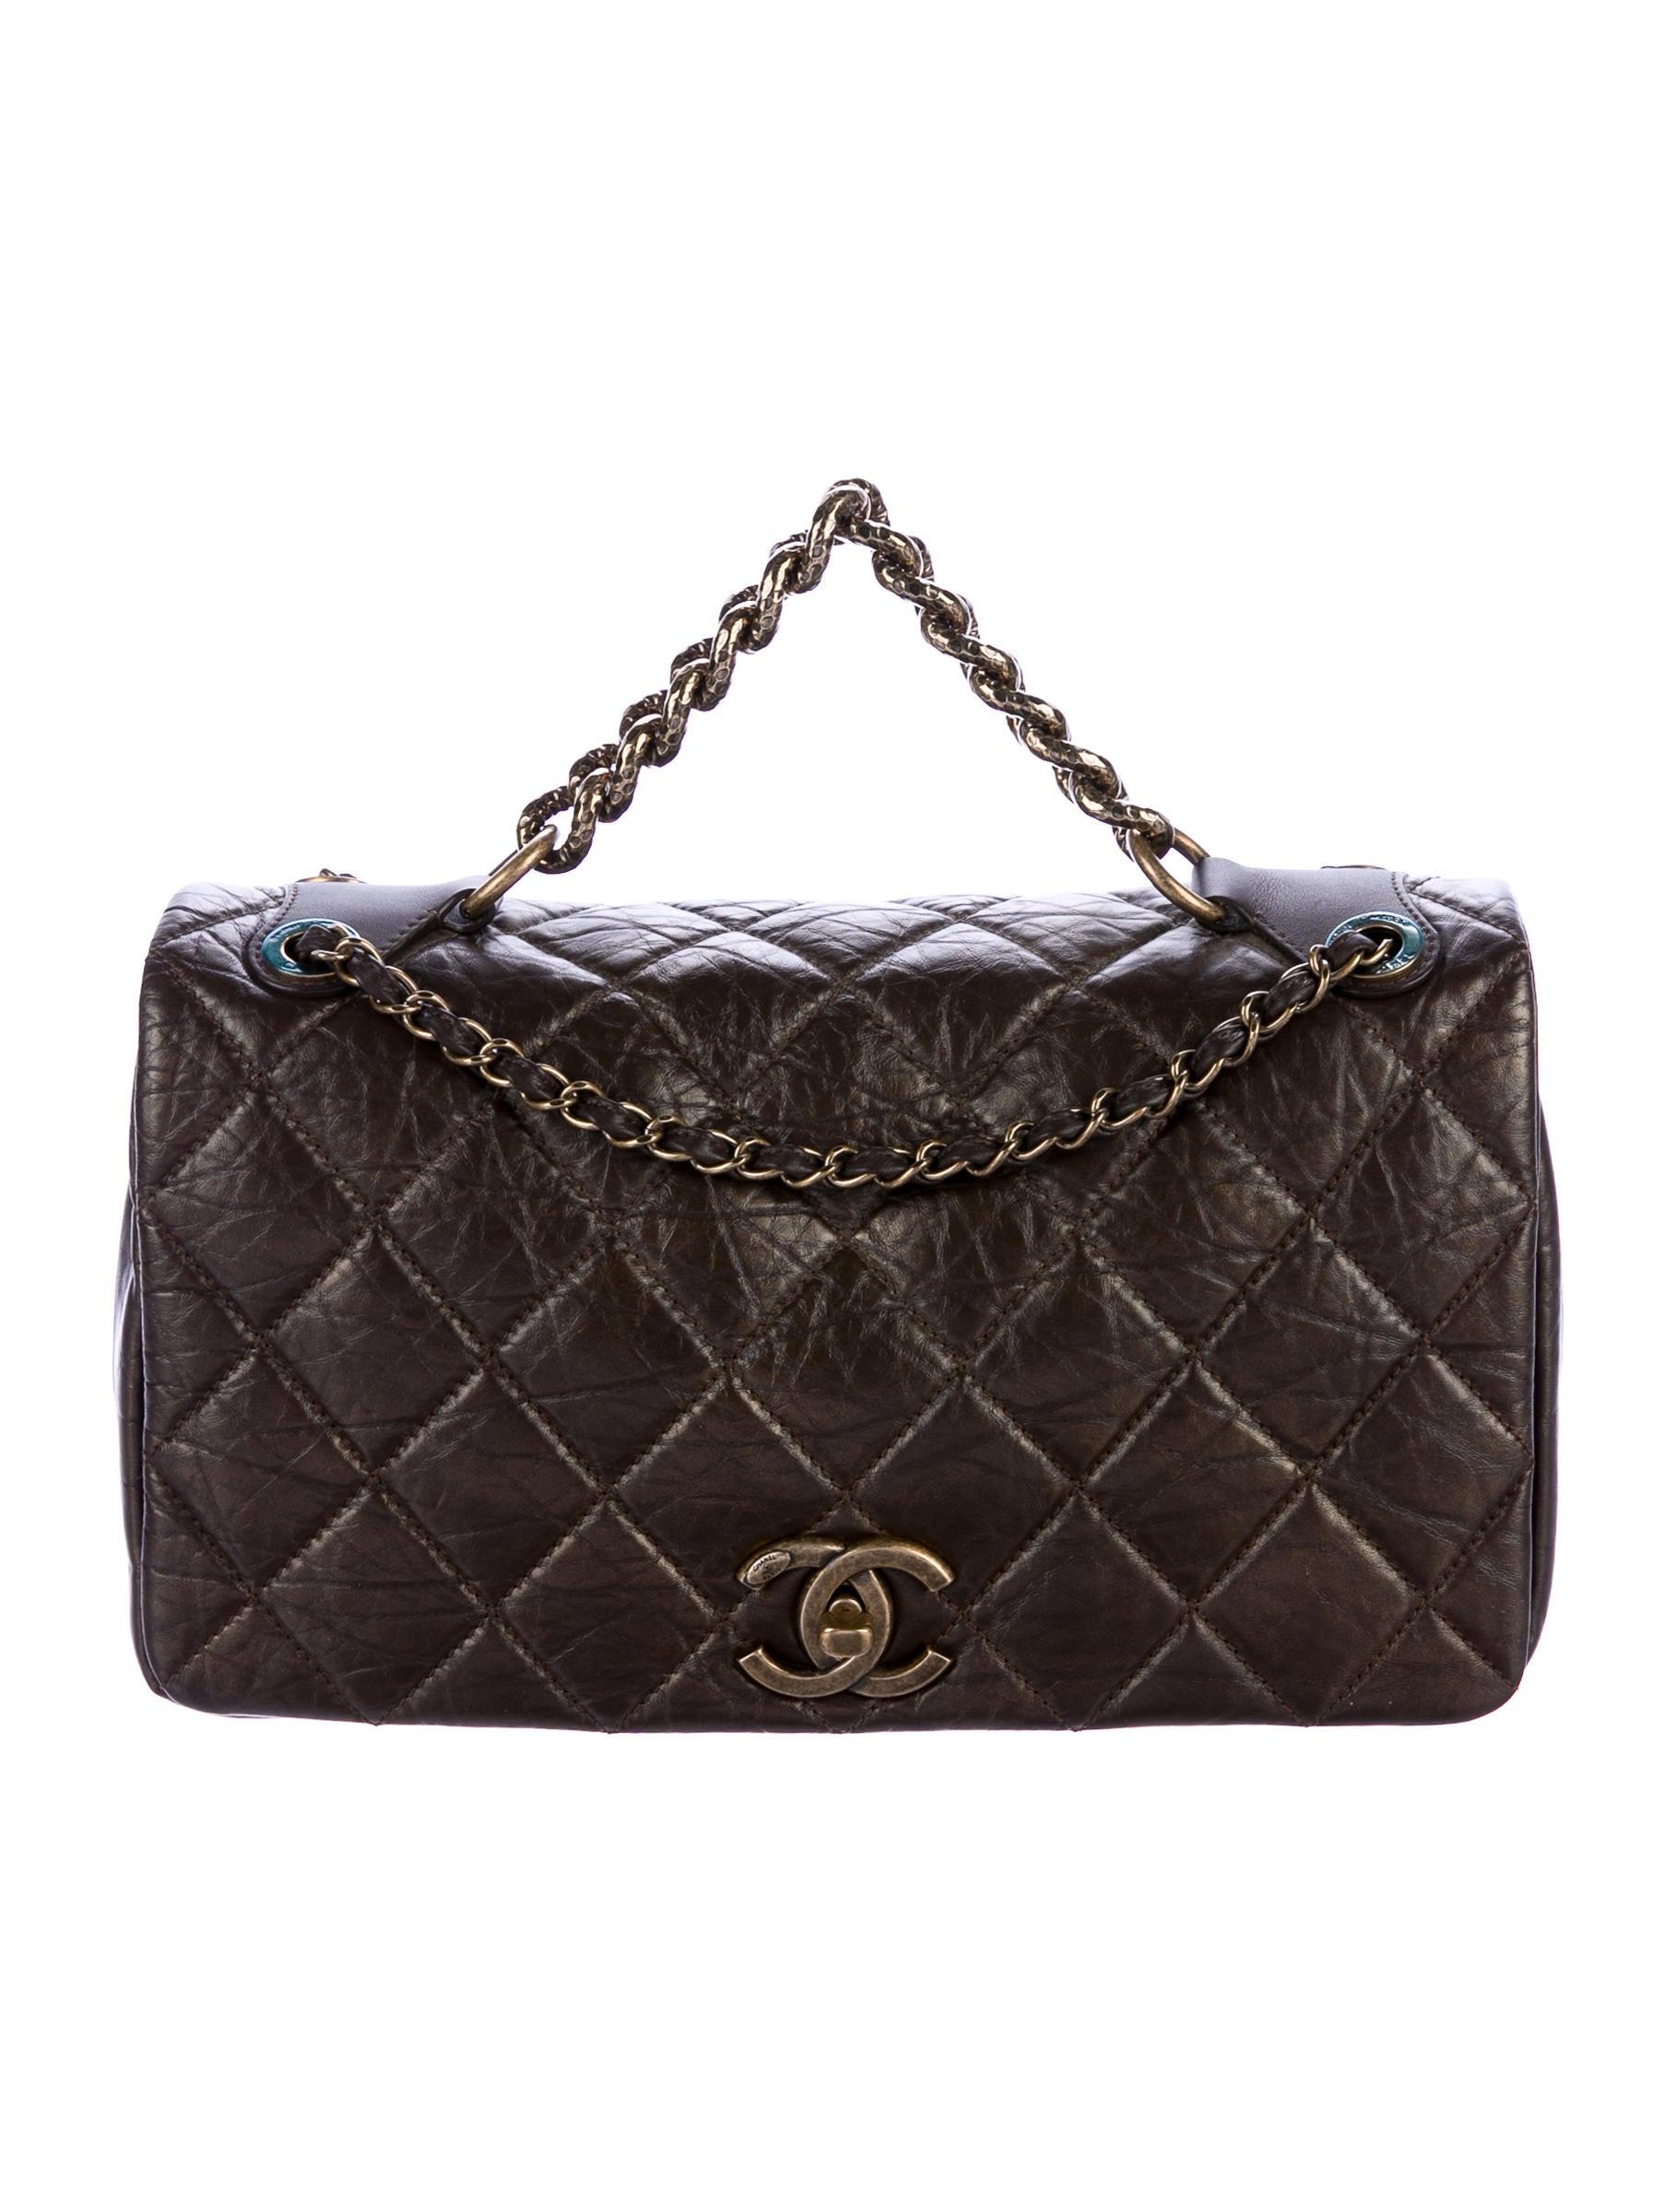 3d5434e1a282 Chanel Pondicherry Large Flap Bag w/ Tags - Handbags - CHA203609 | The  RealReal